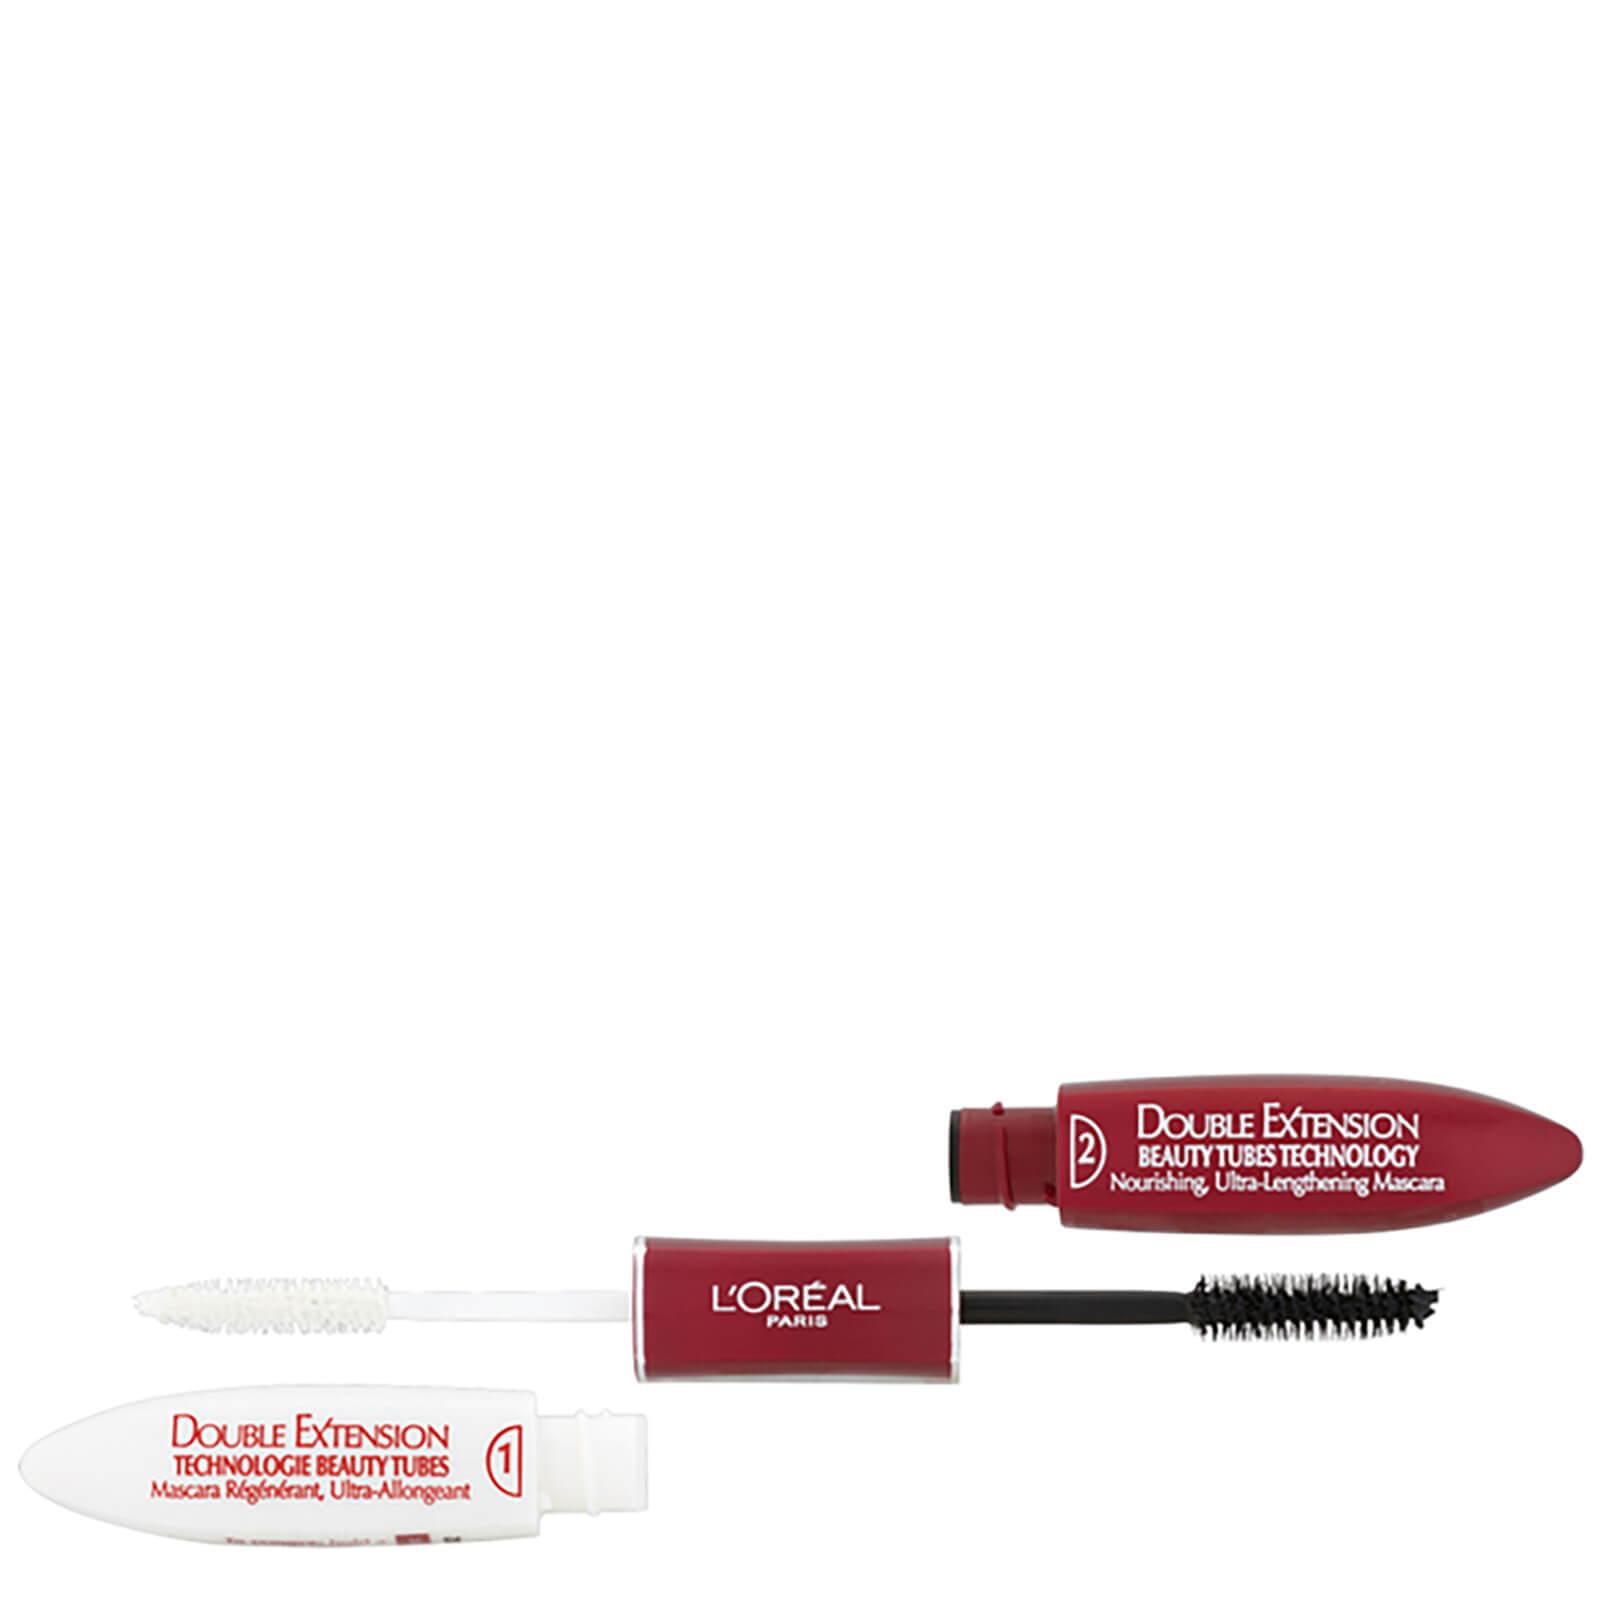 07b5cf50b6d L'Oréal Paris Double Extension Beauty Tube Mascara - Black | Free Shipping  | Lookfantastic